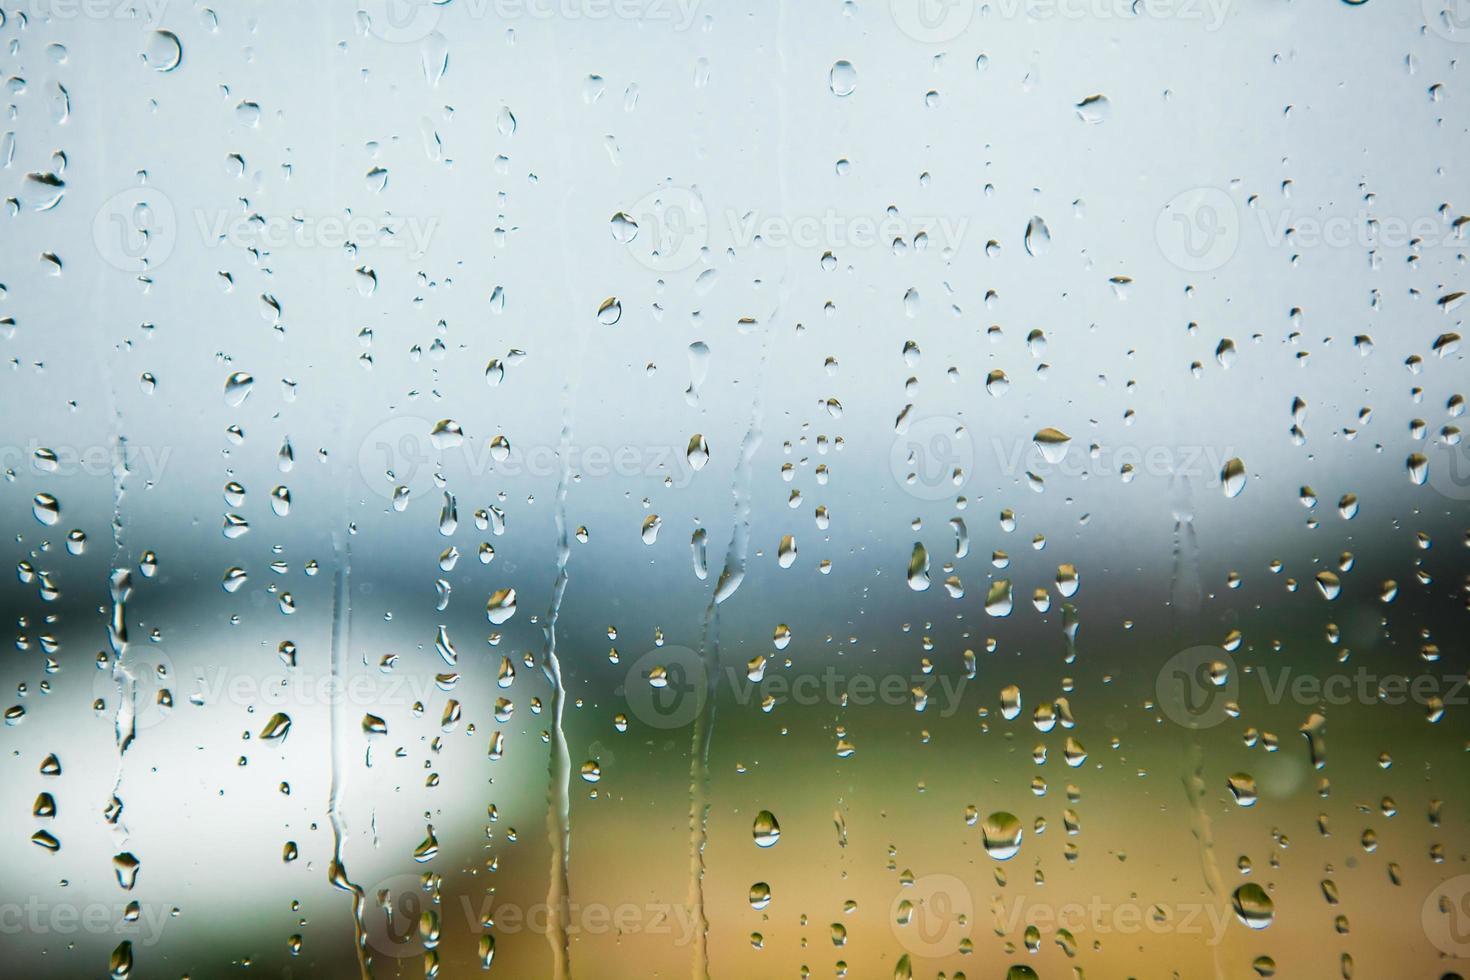 pingos de chuva foto